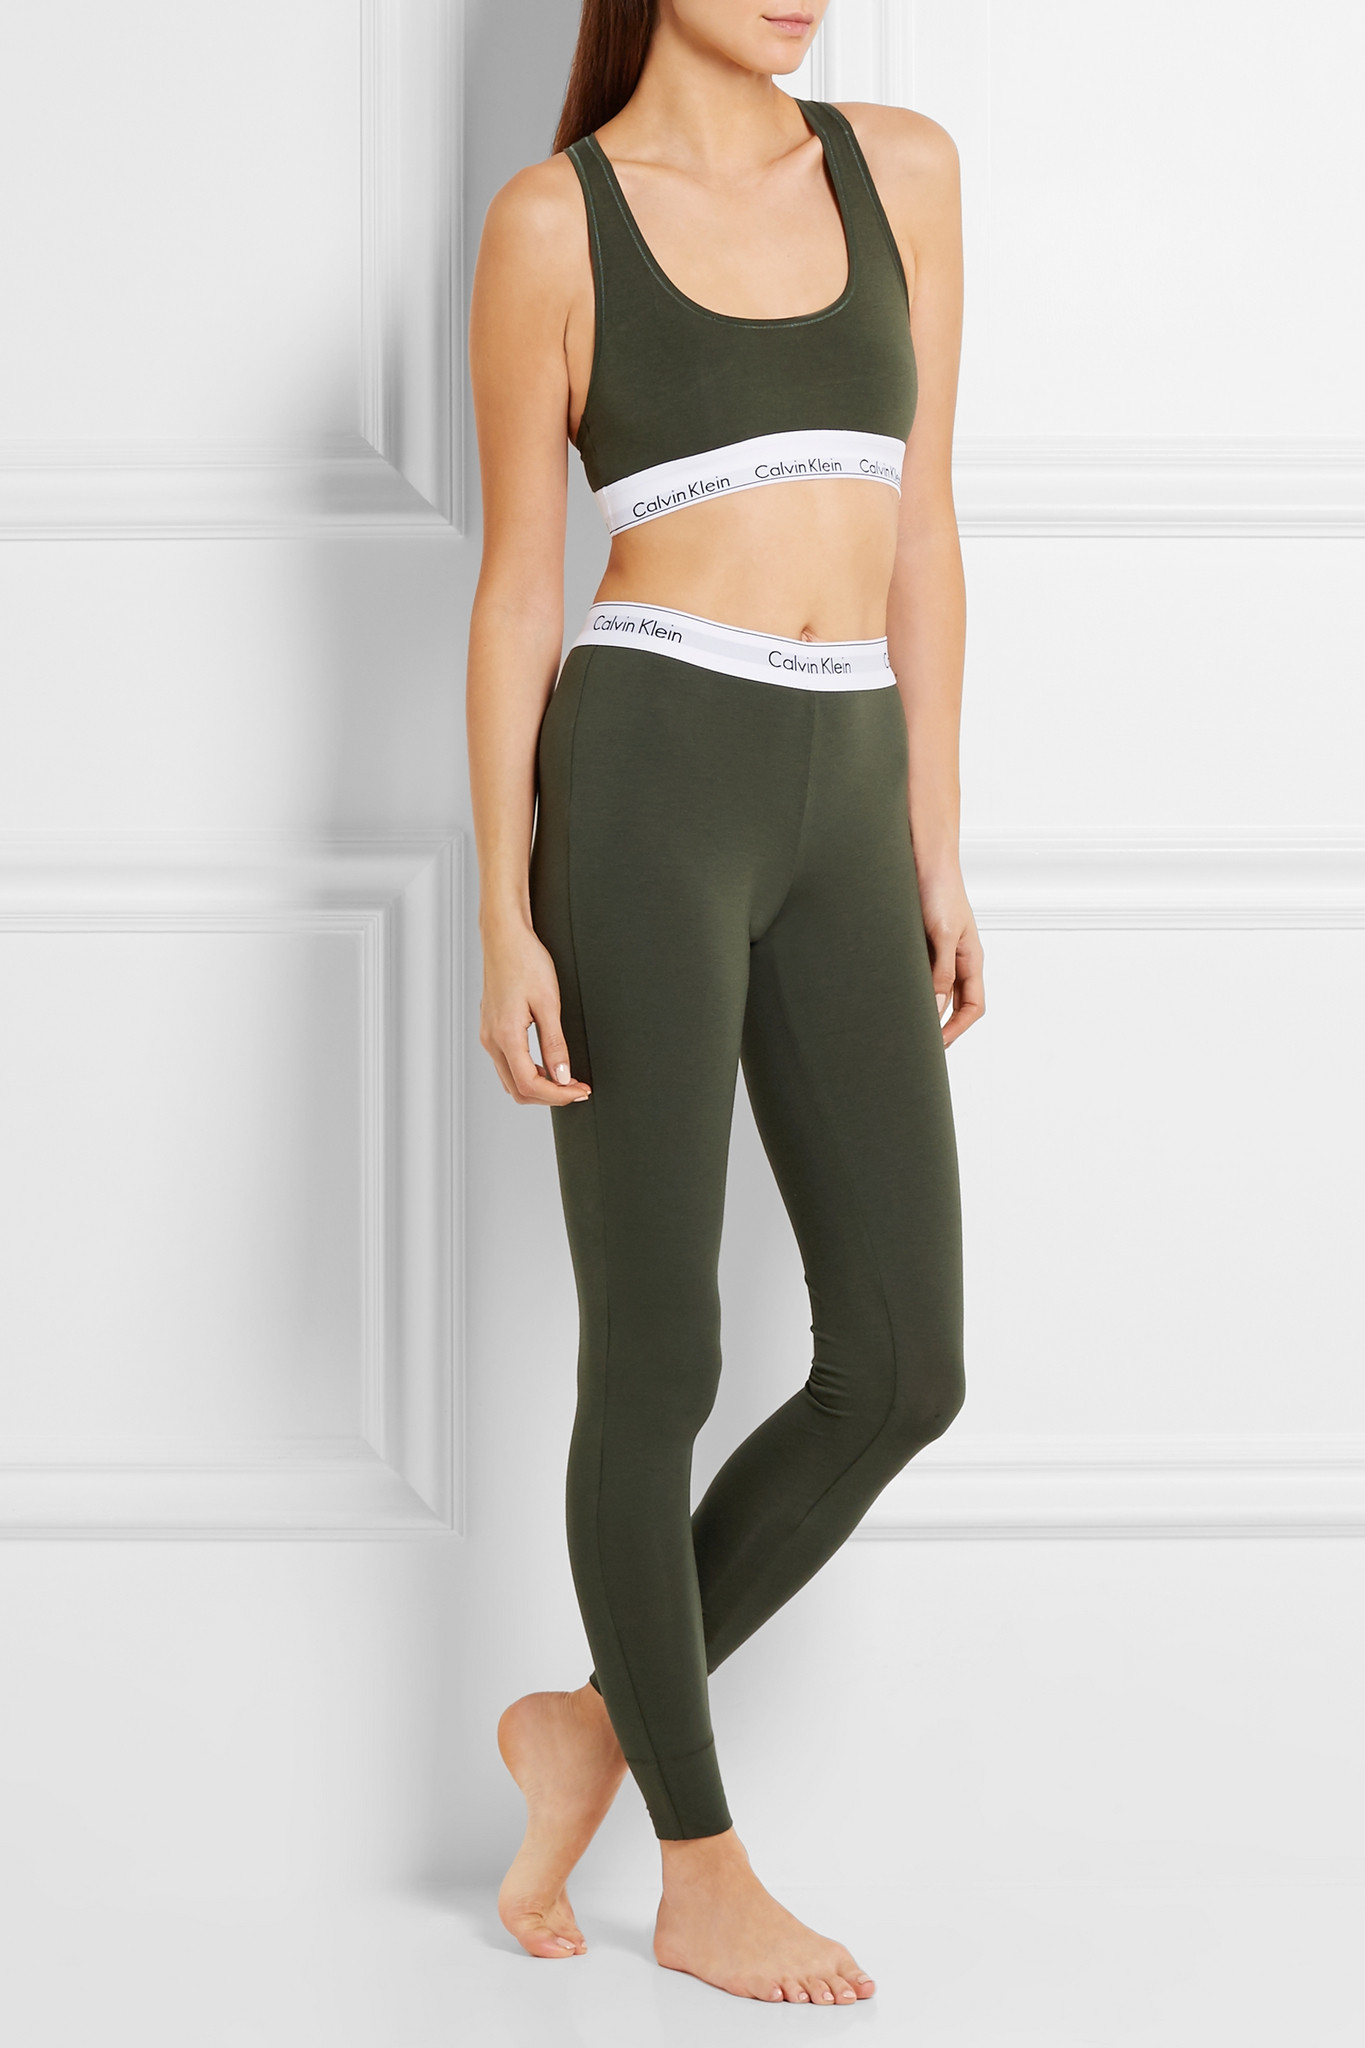 bbb5863390 Lyst - Calvin Klein Modern Stretch Cotton-blend Leggings in Green